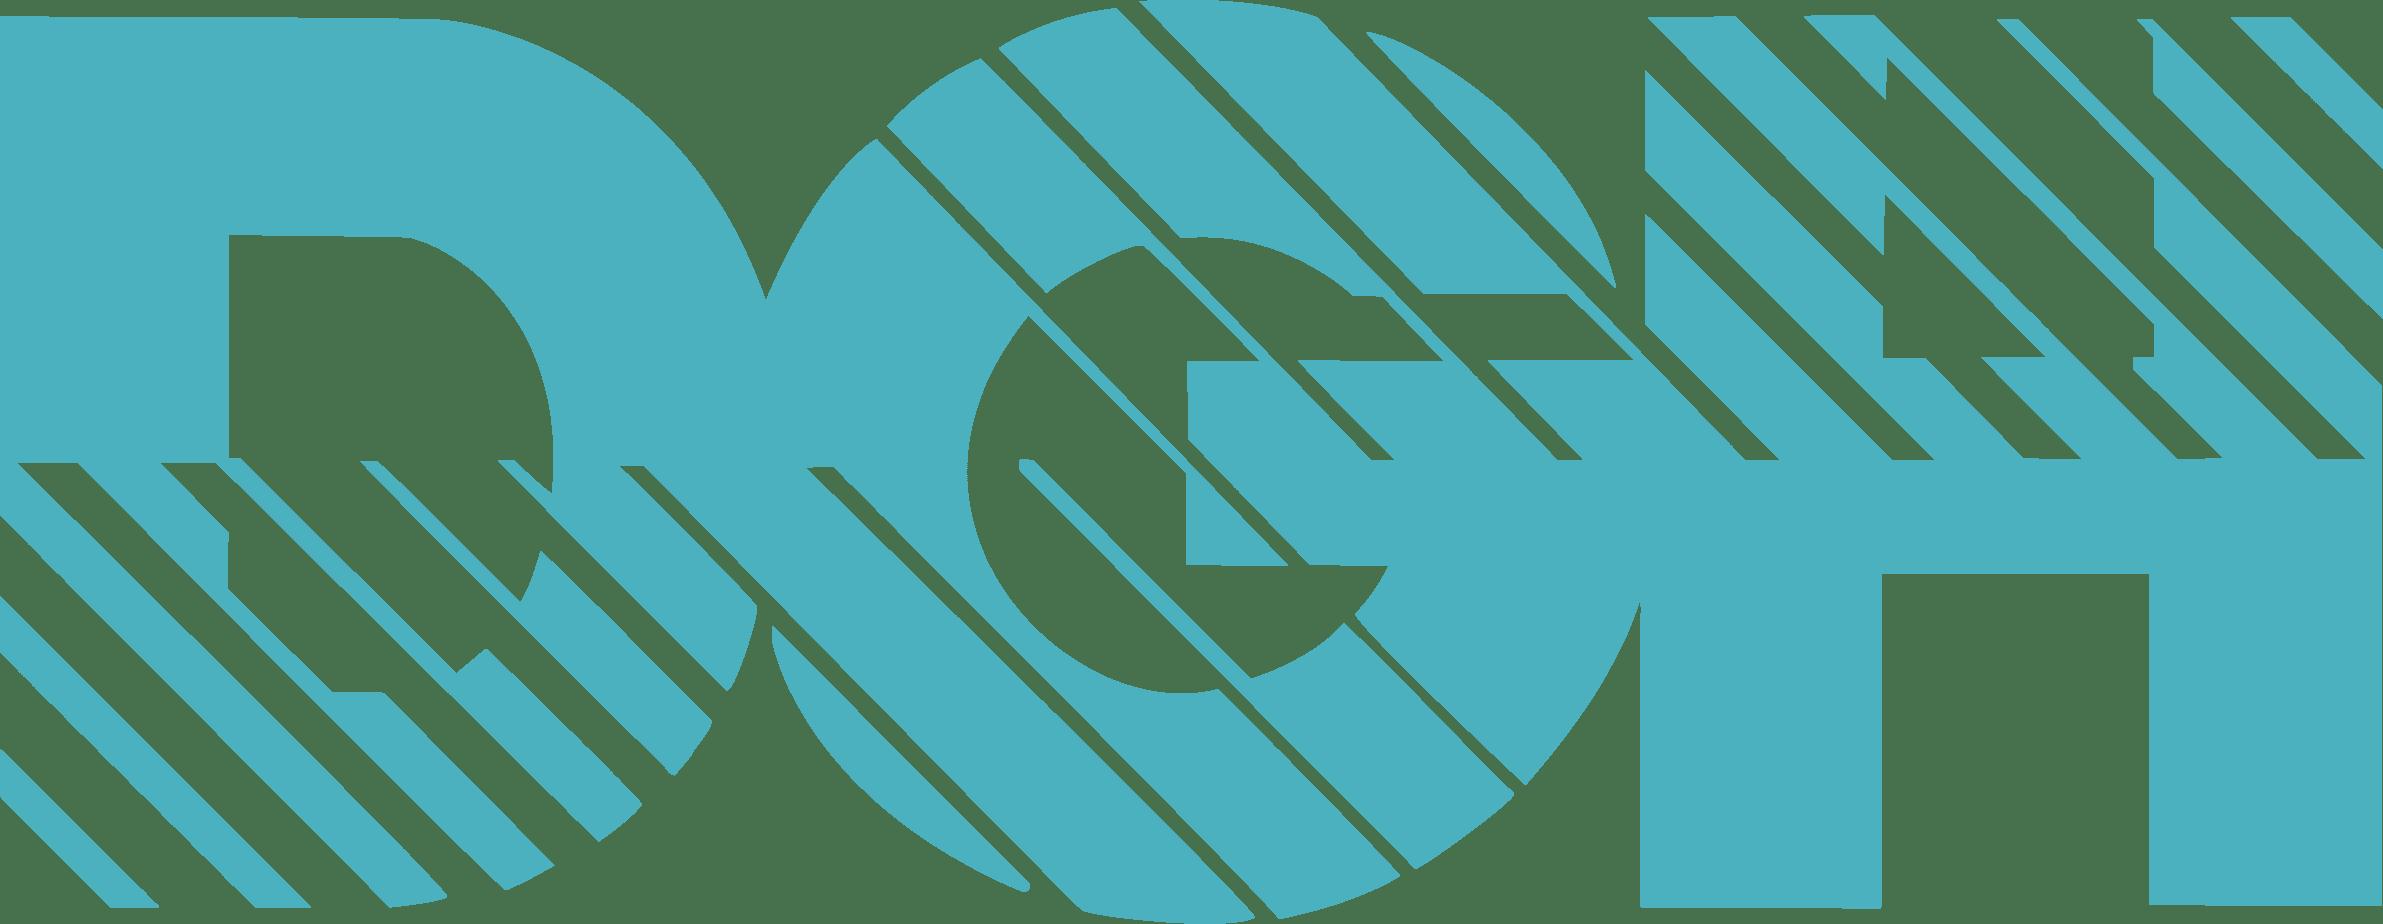 DGH Company Logo 2020